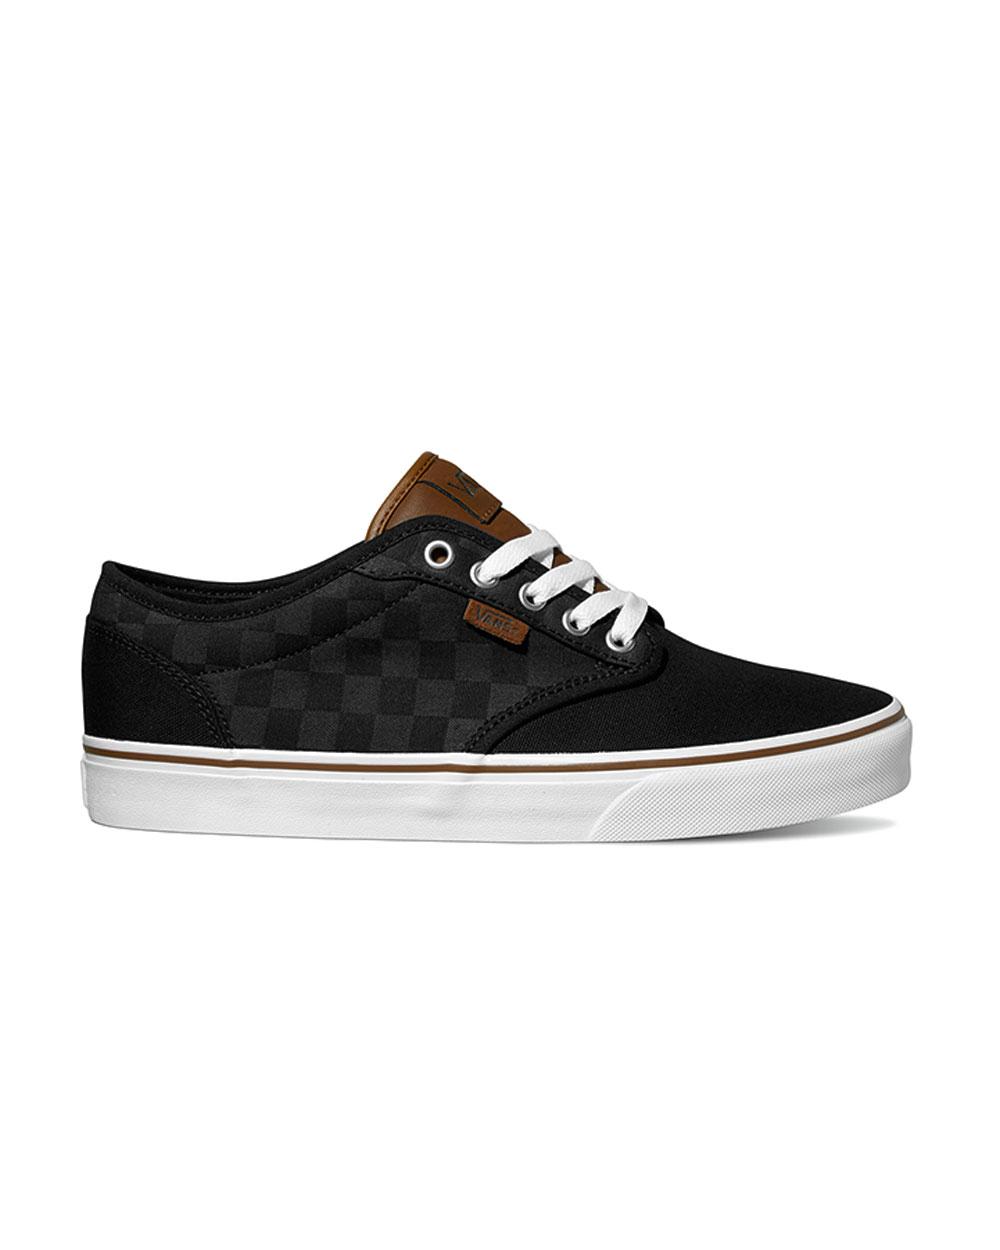 Vans Atwood C&L (black check)